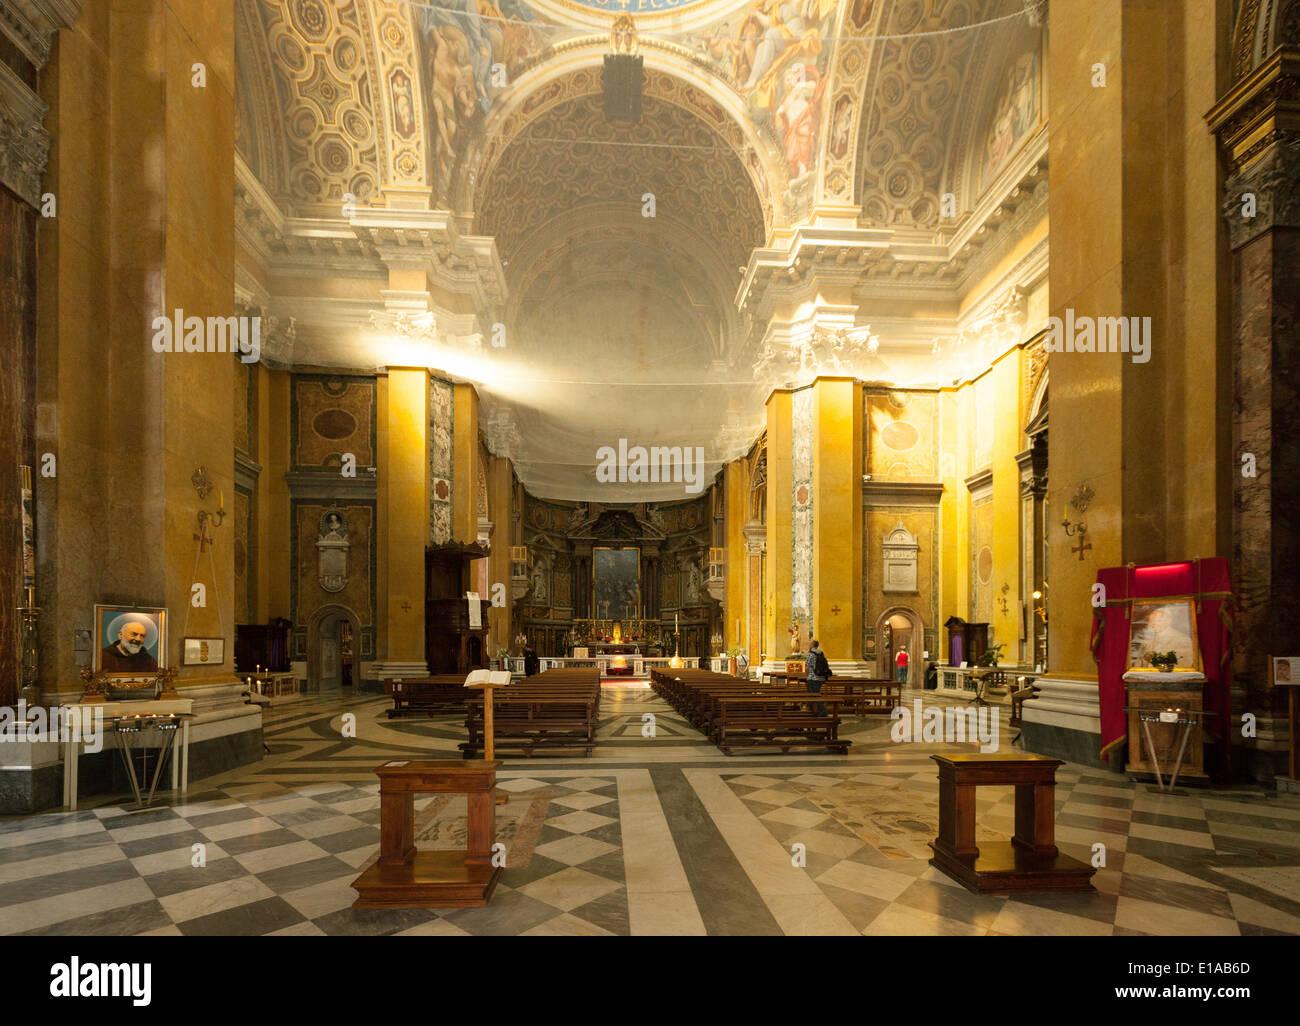 Interior of Santa Carlo Ai Catinari Church, Rome Italy, Europe - Stock Image